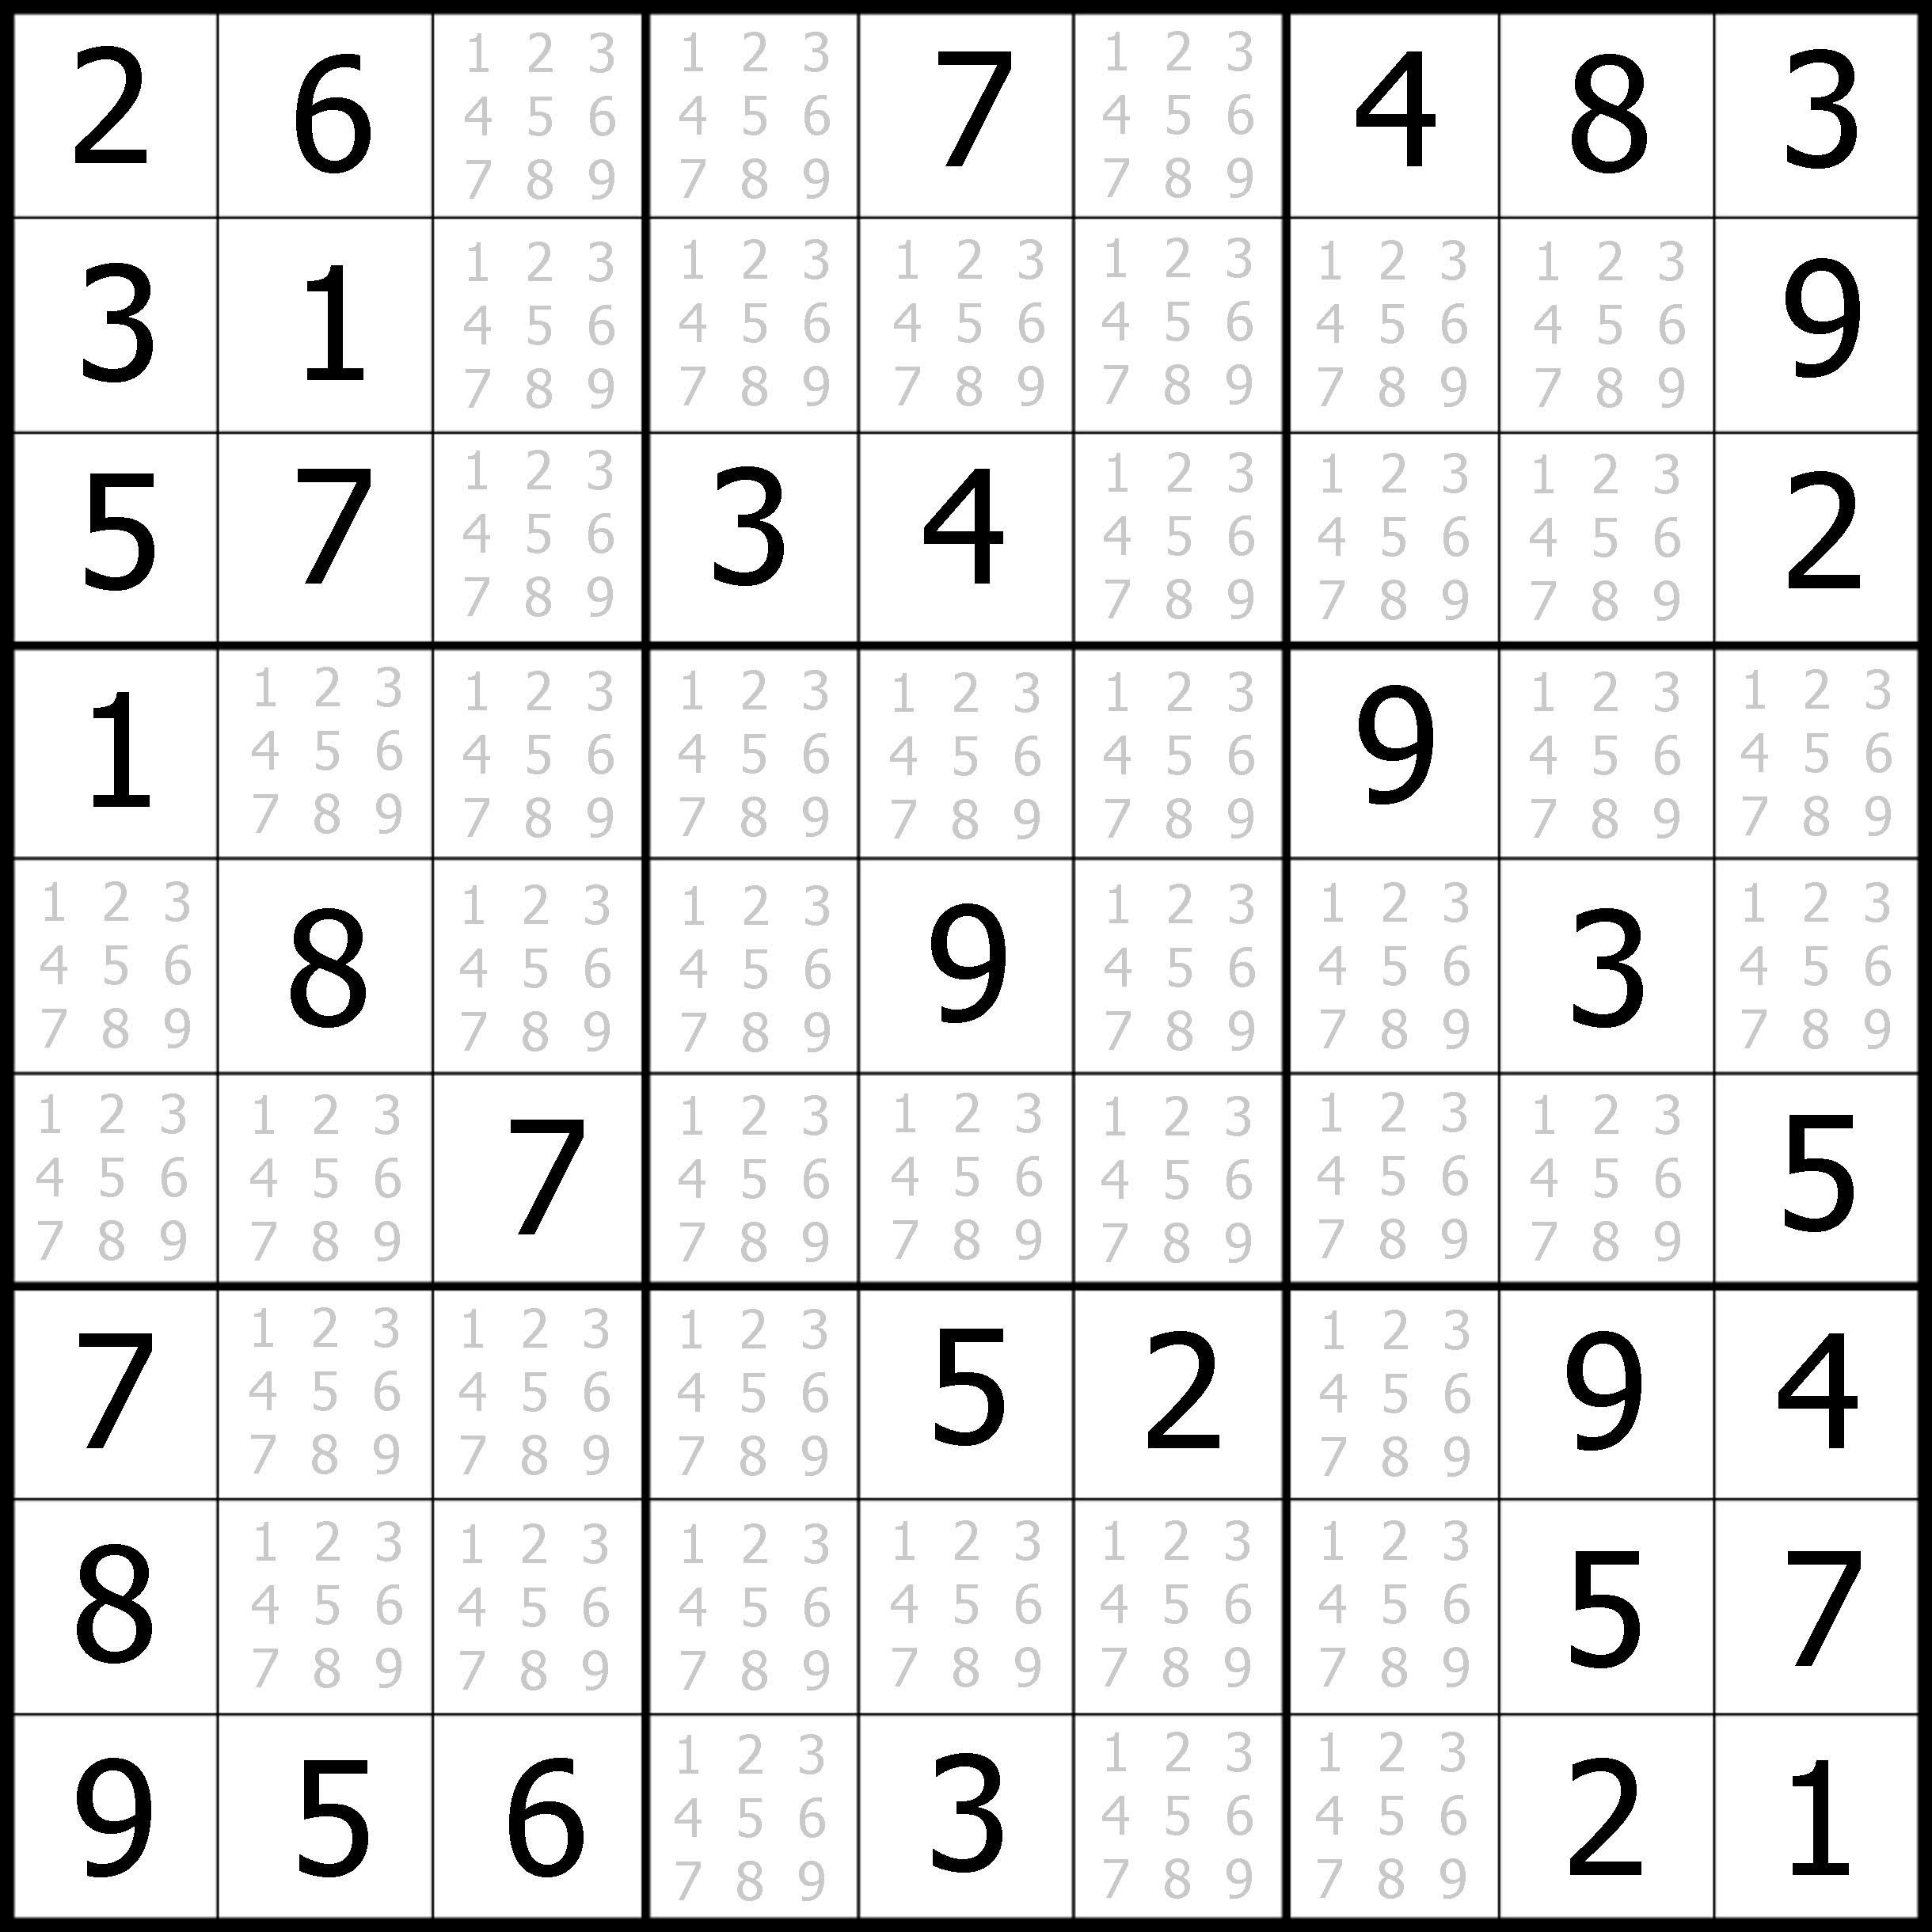 Sudoku Puzzler | Free, Printable, Updated Sudoku Puzzles With A - Free Printable Sudoku Puzzles